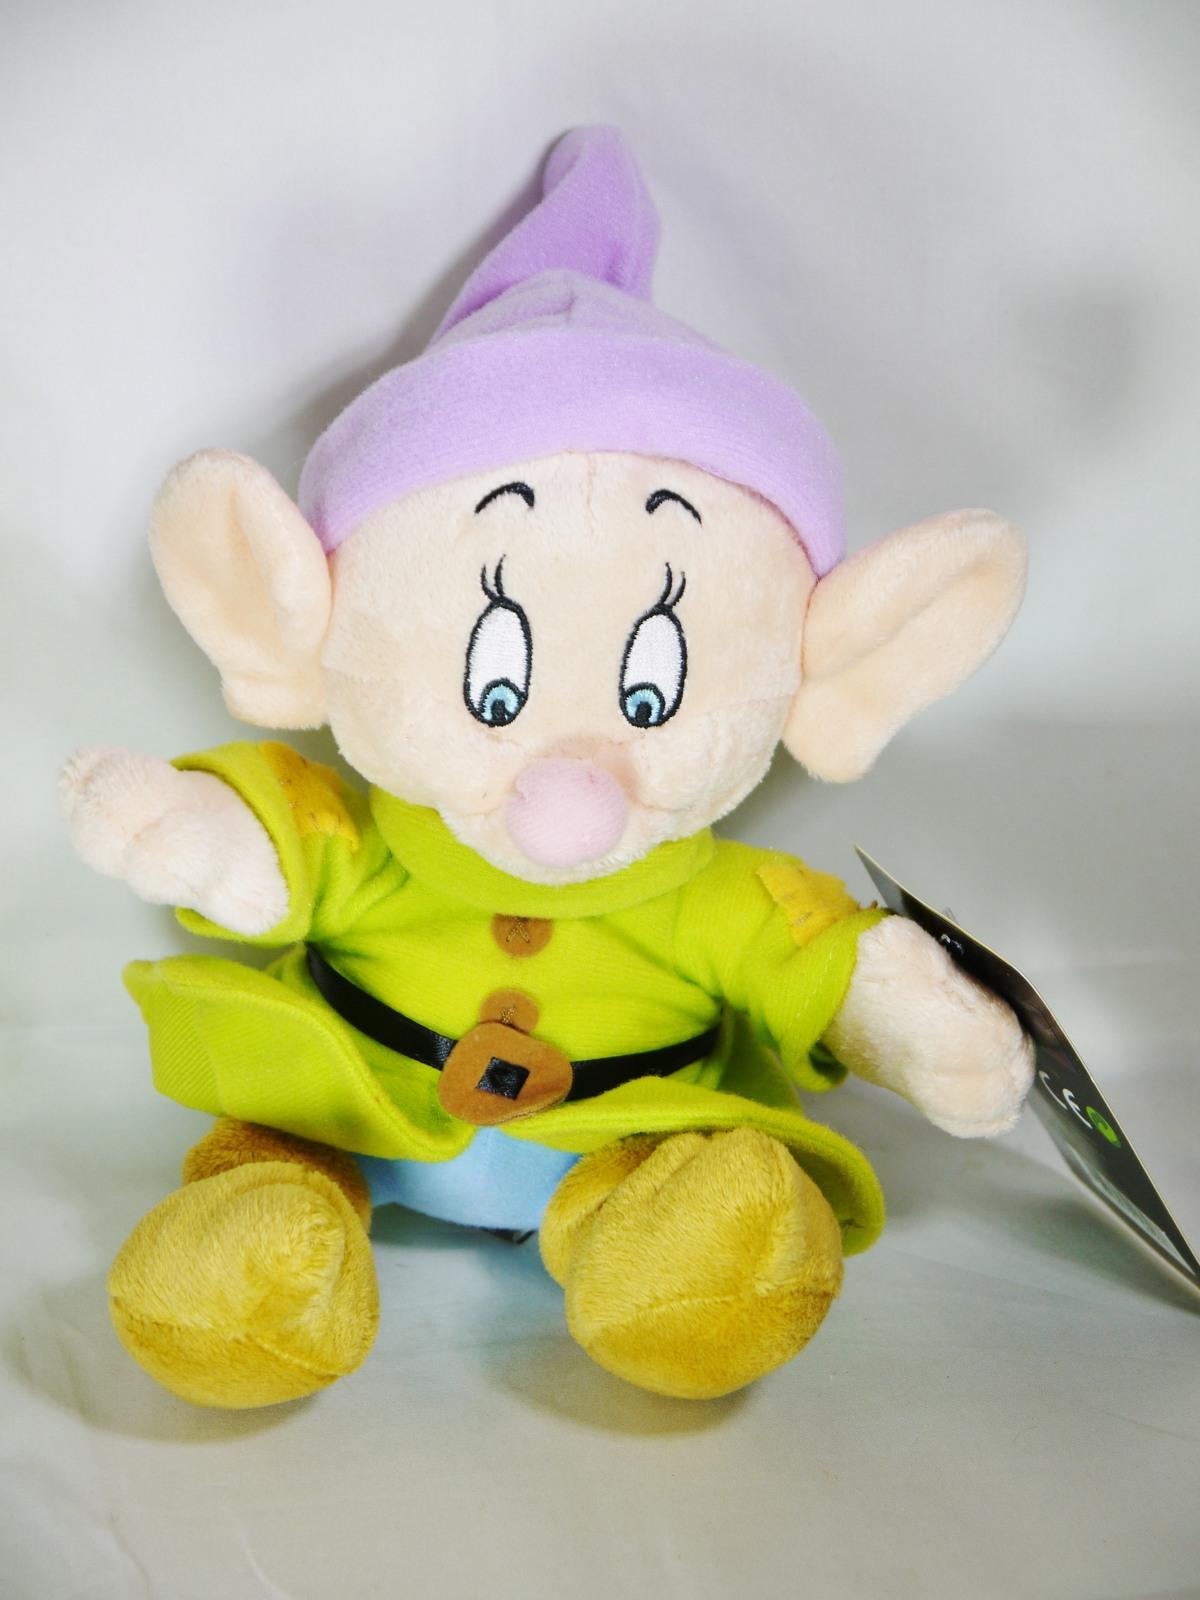 Disney snow white   7 dwarfs dopey plush toy 1